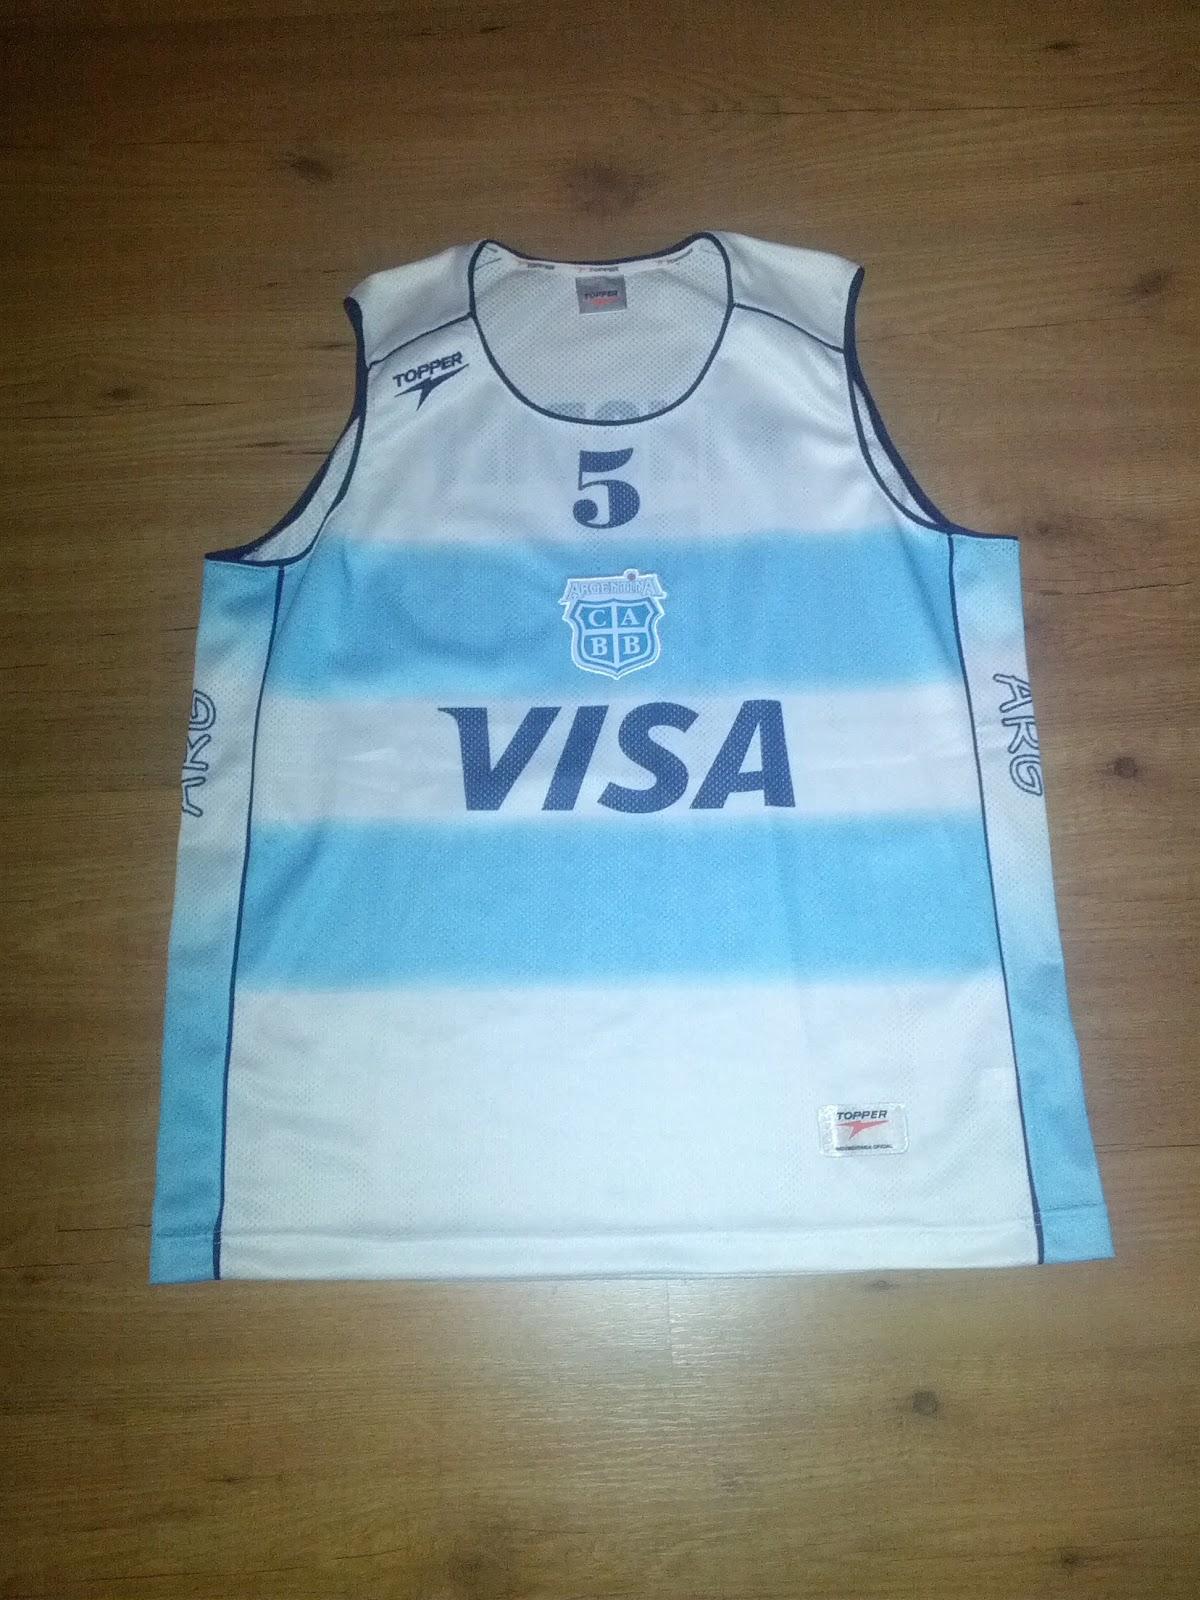 Jerseys Fiba Players Euroleague In Basketball International And dexBroCW